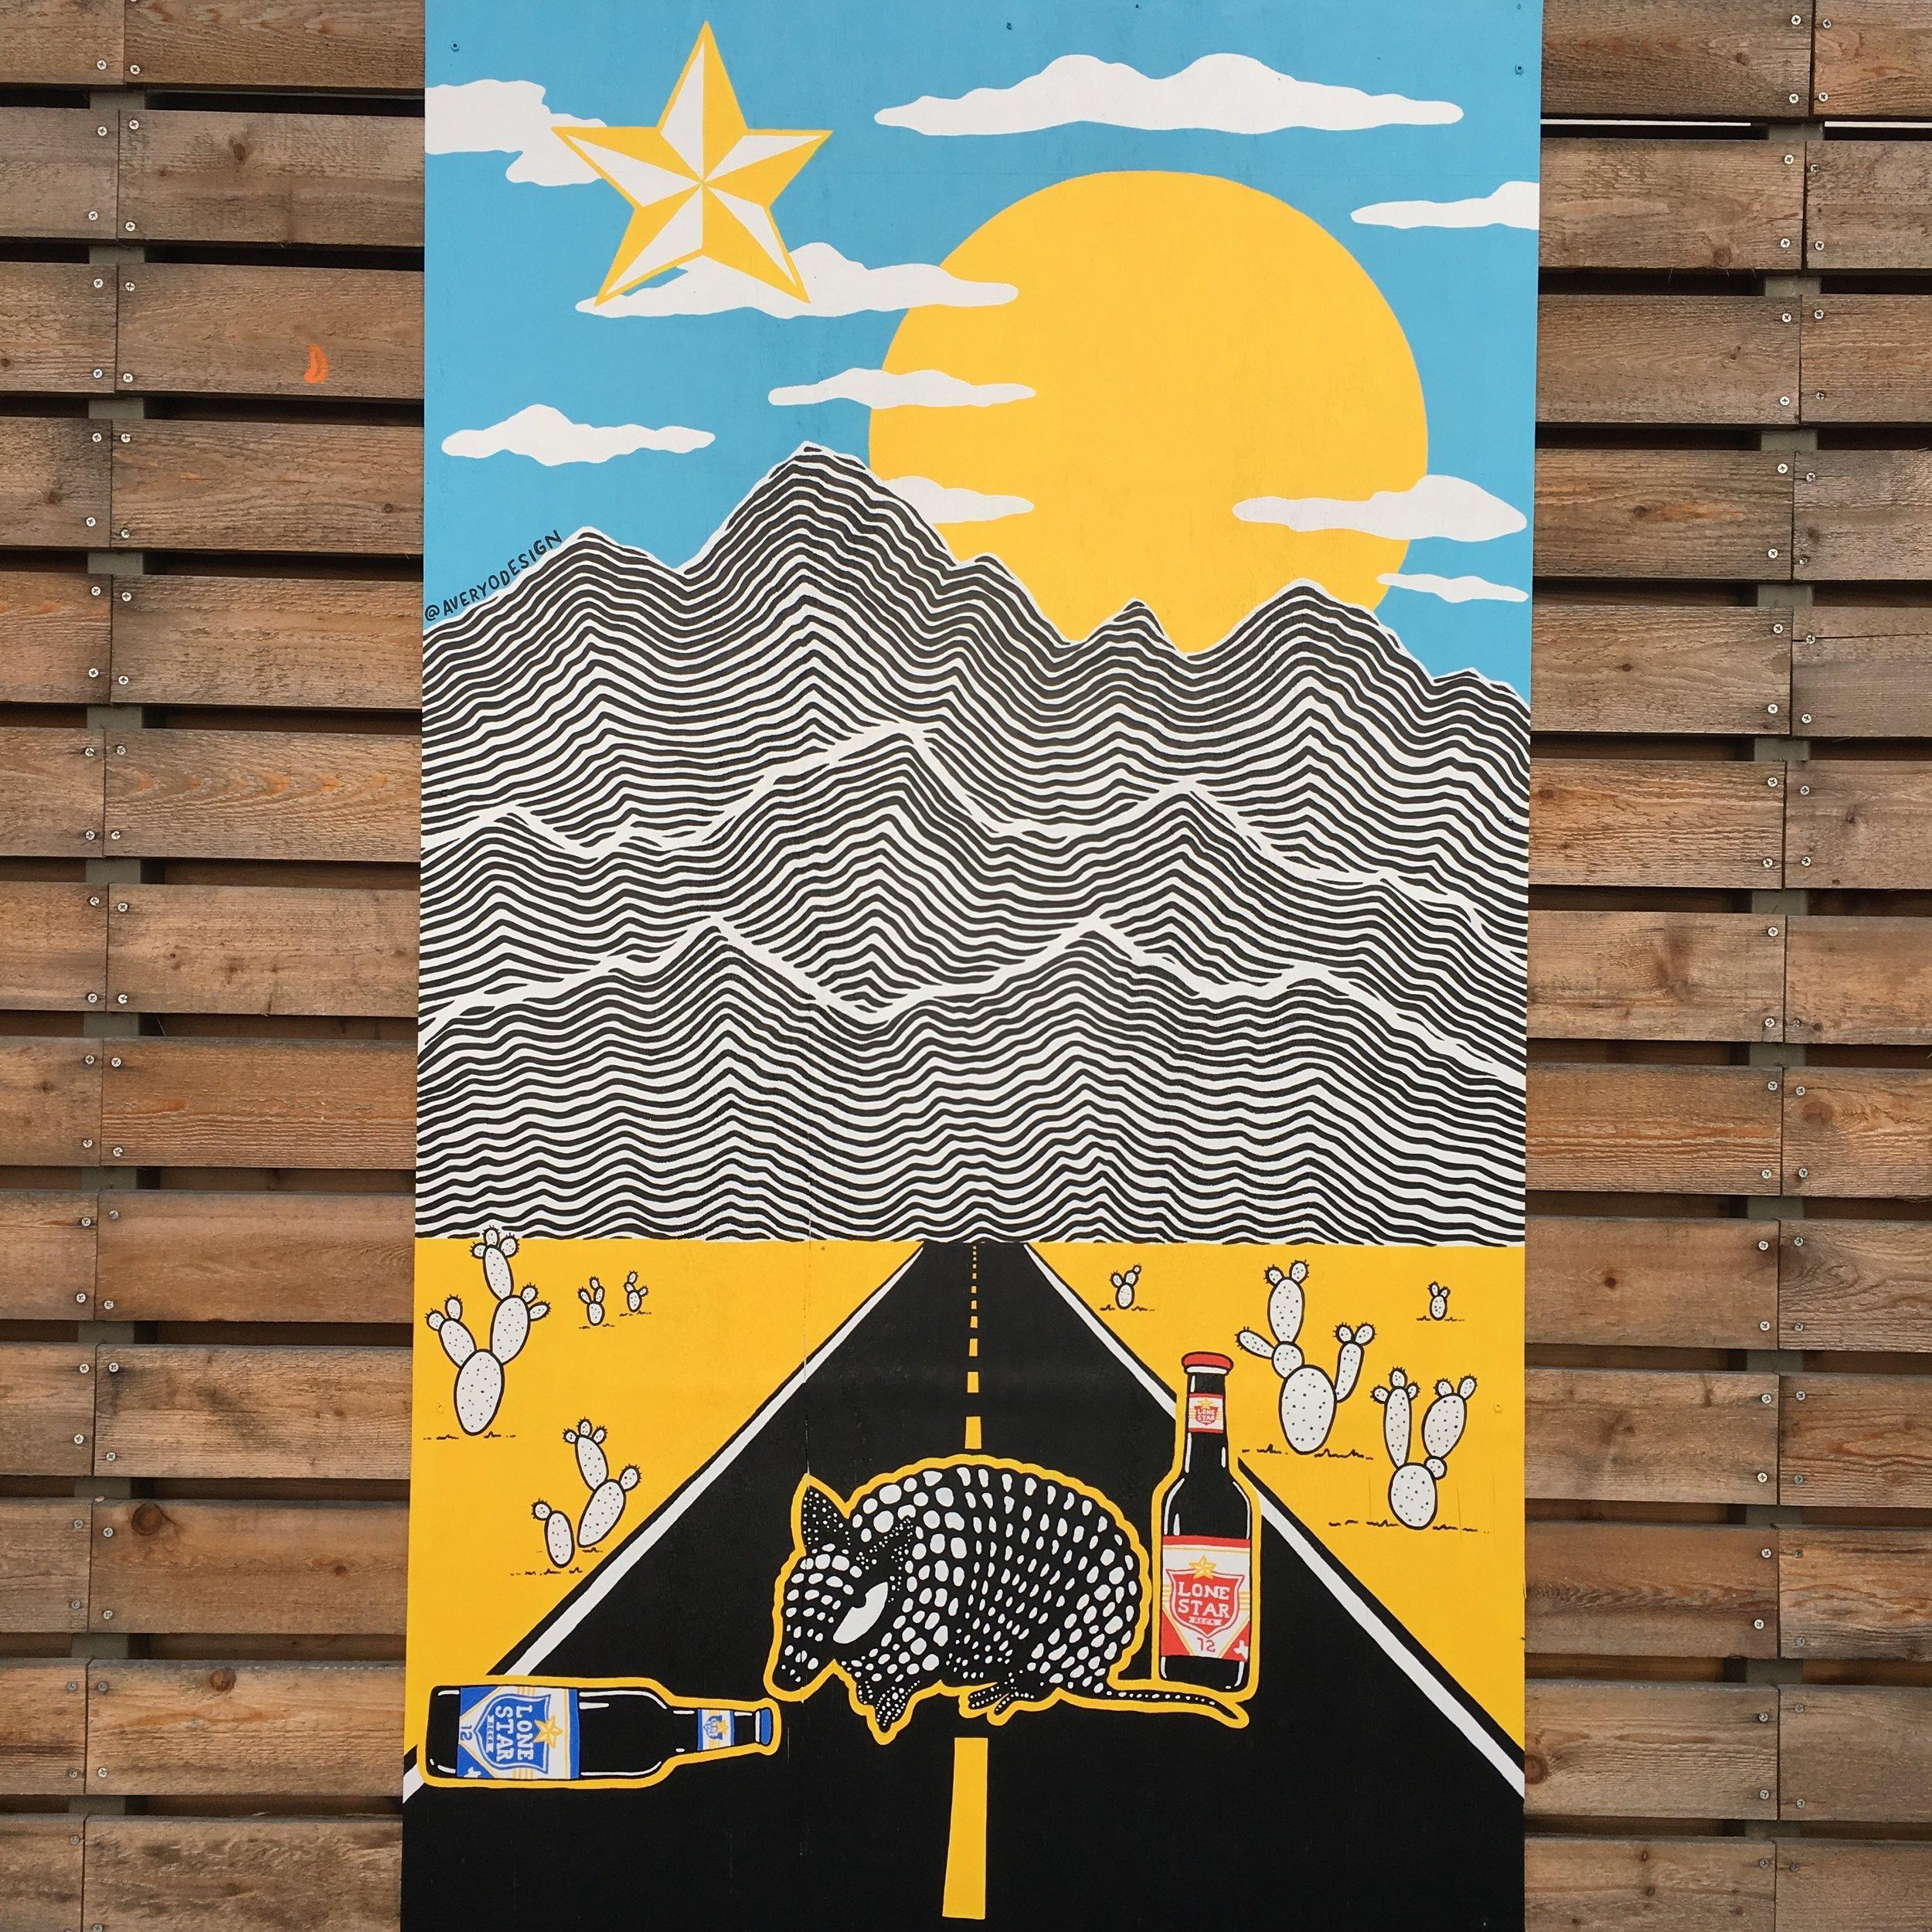 Lonestar Mural at The Liberty